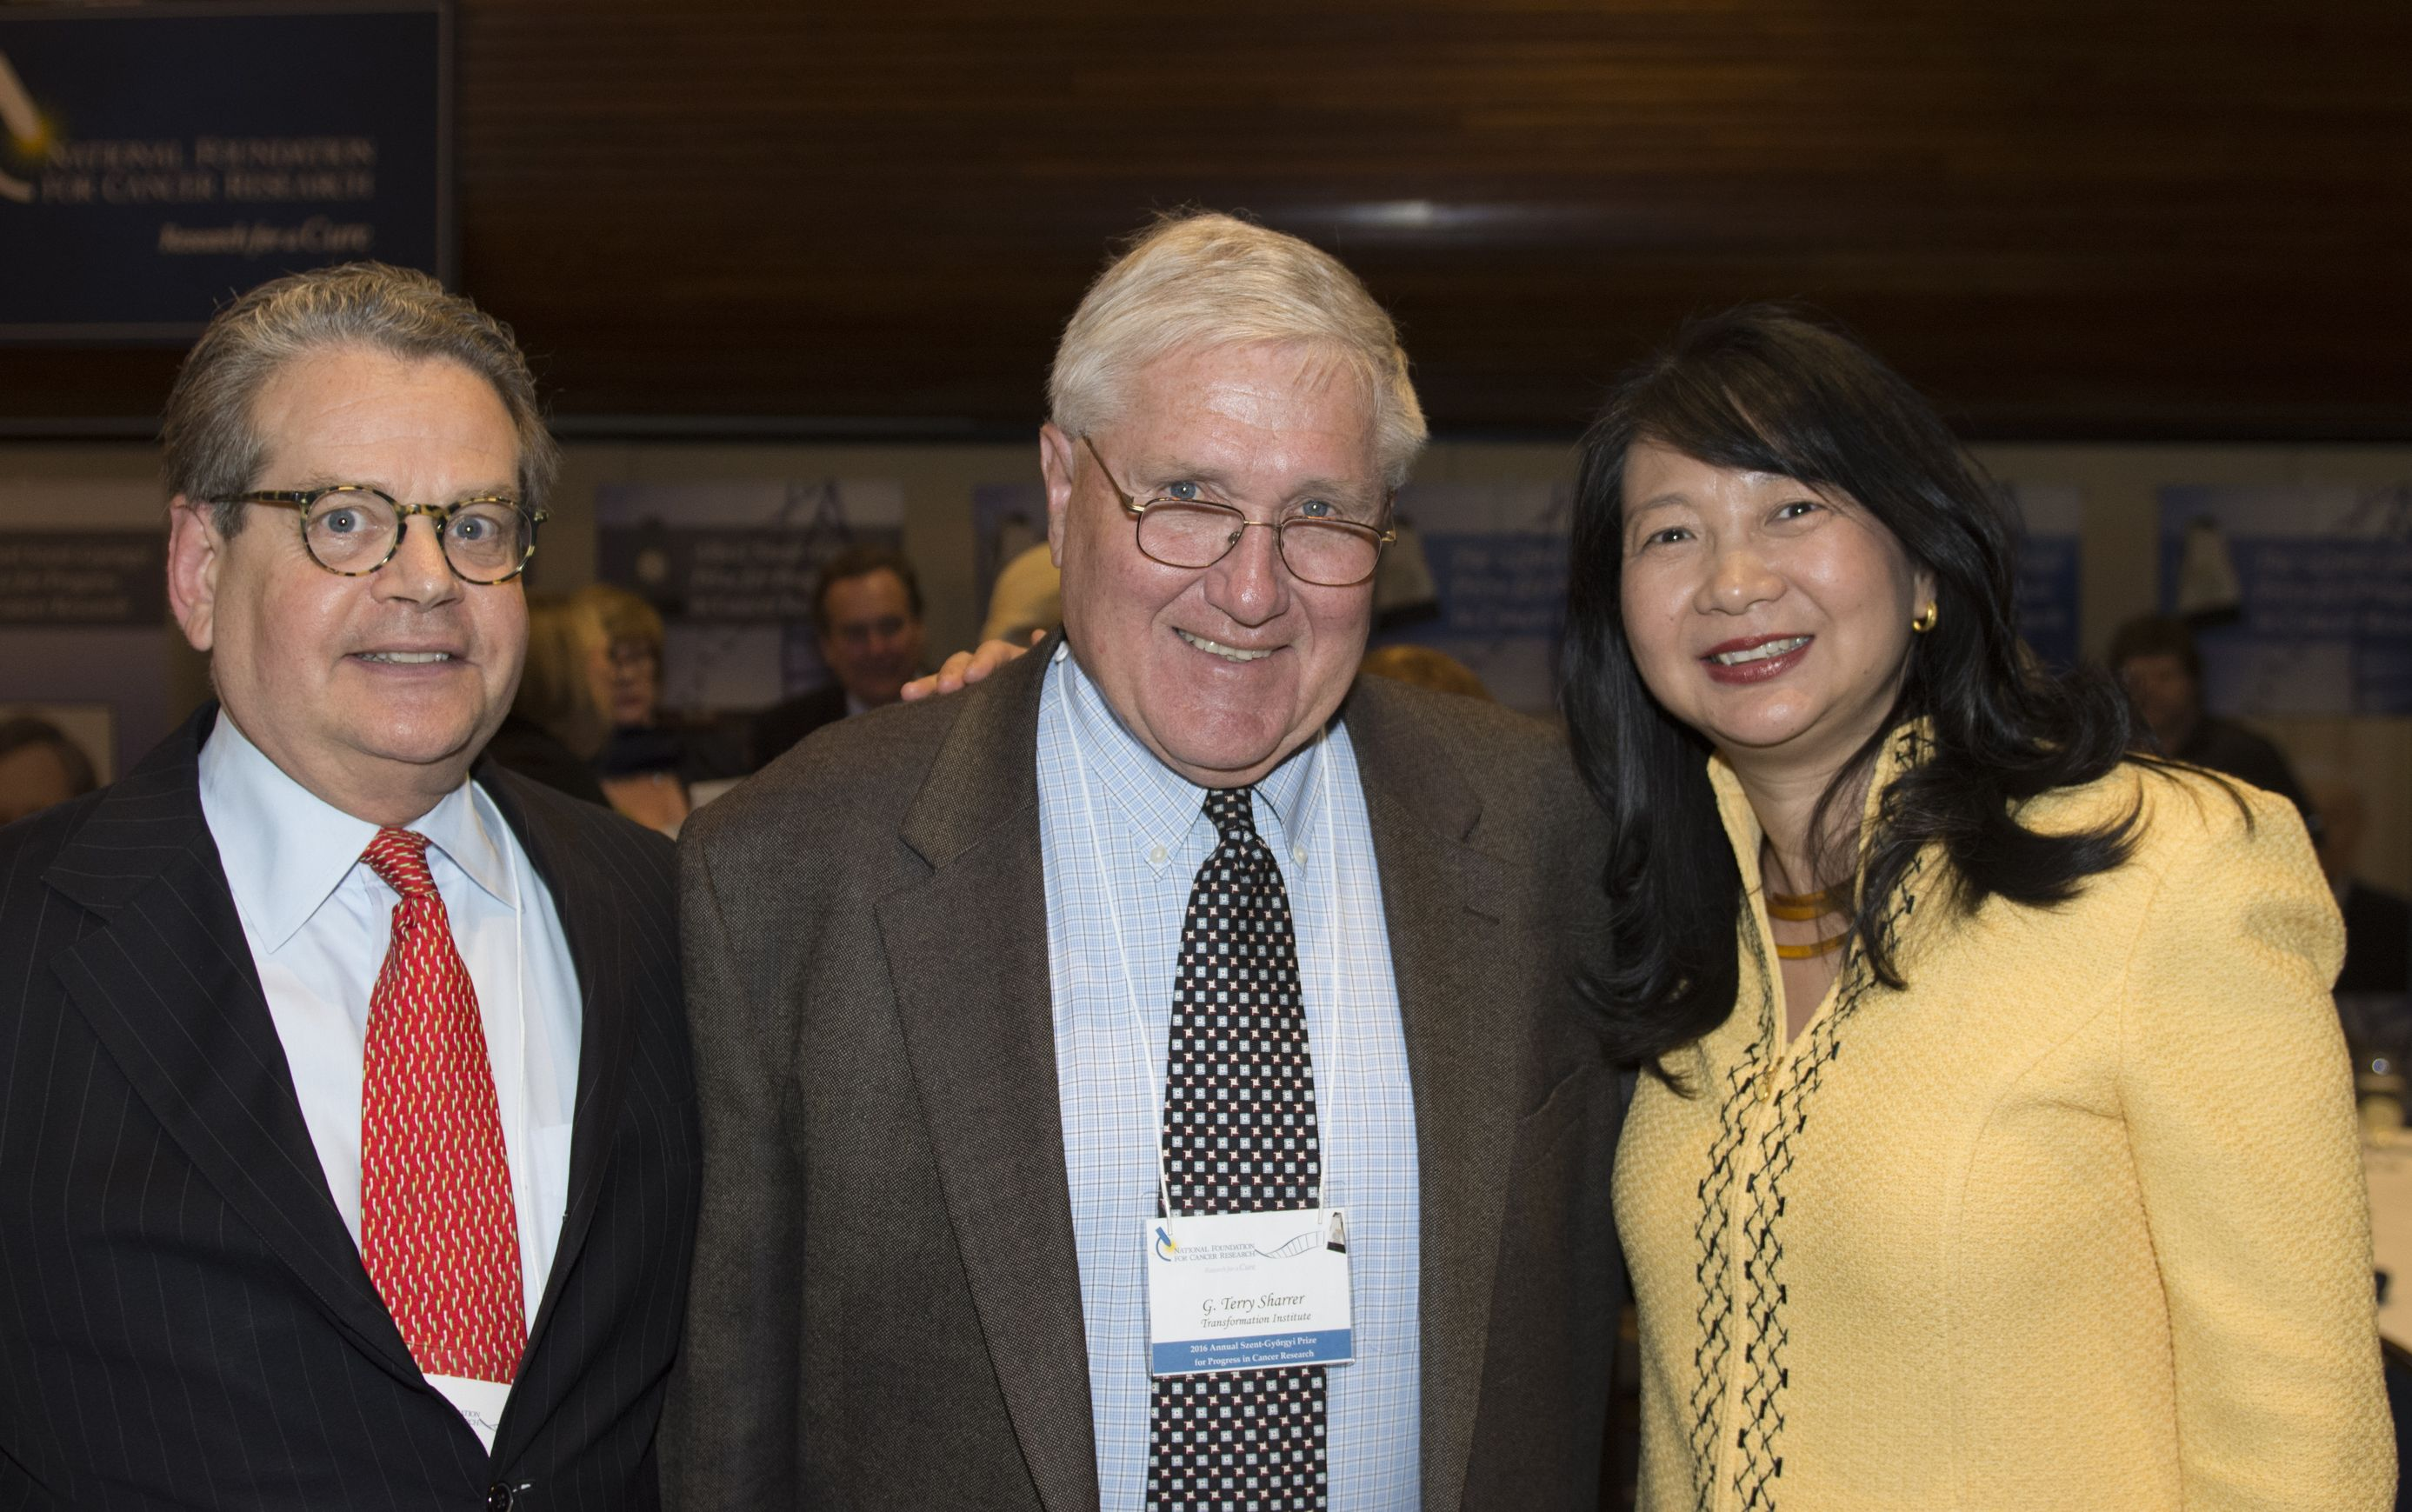 Long-time friends Franklin Salisbury, Terry Sharrer, and Dr. Sujuan Ba enjoy their reunion